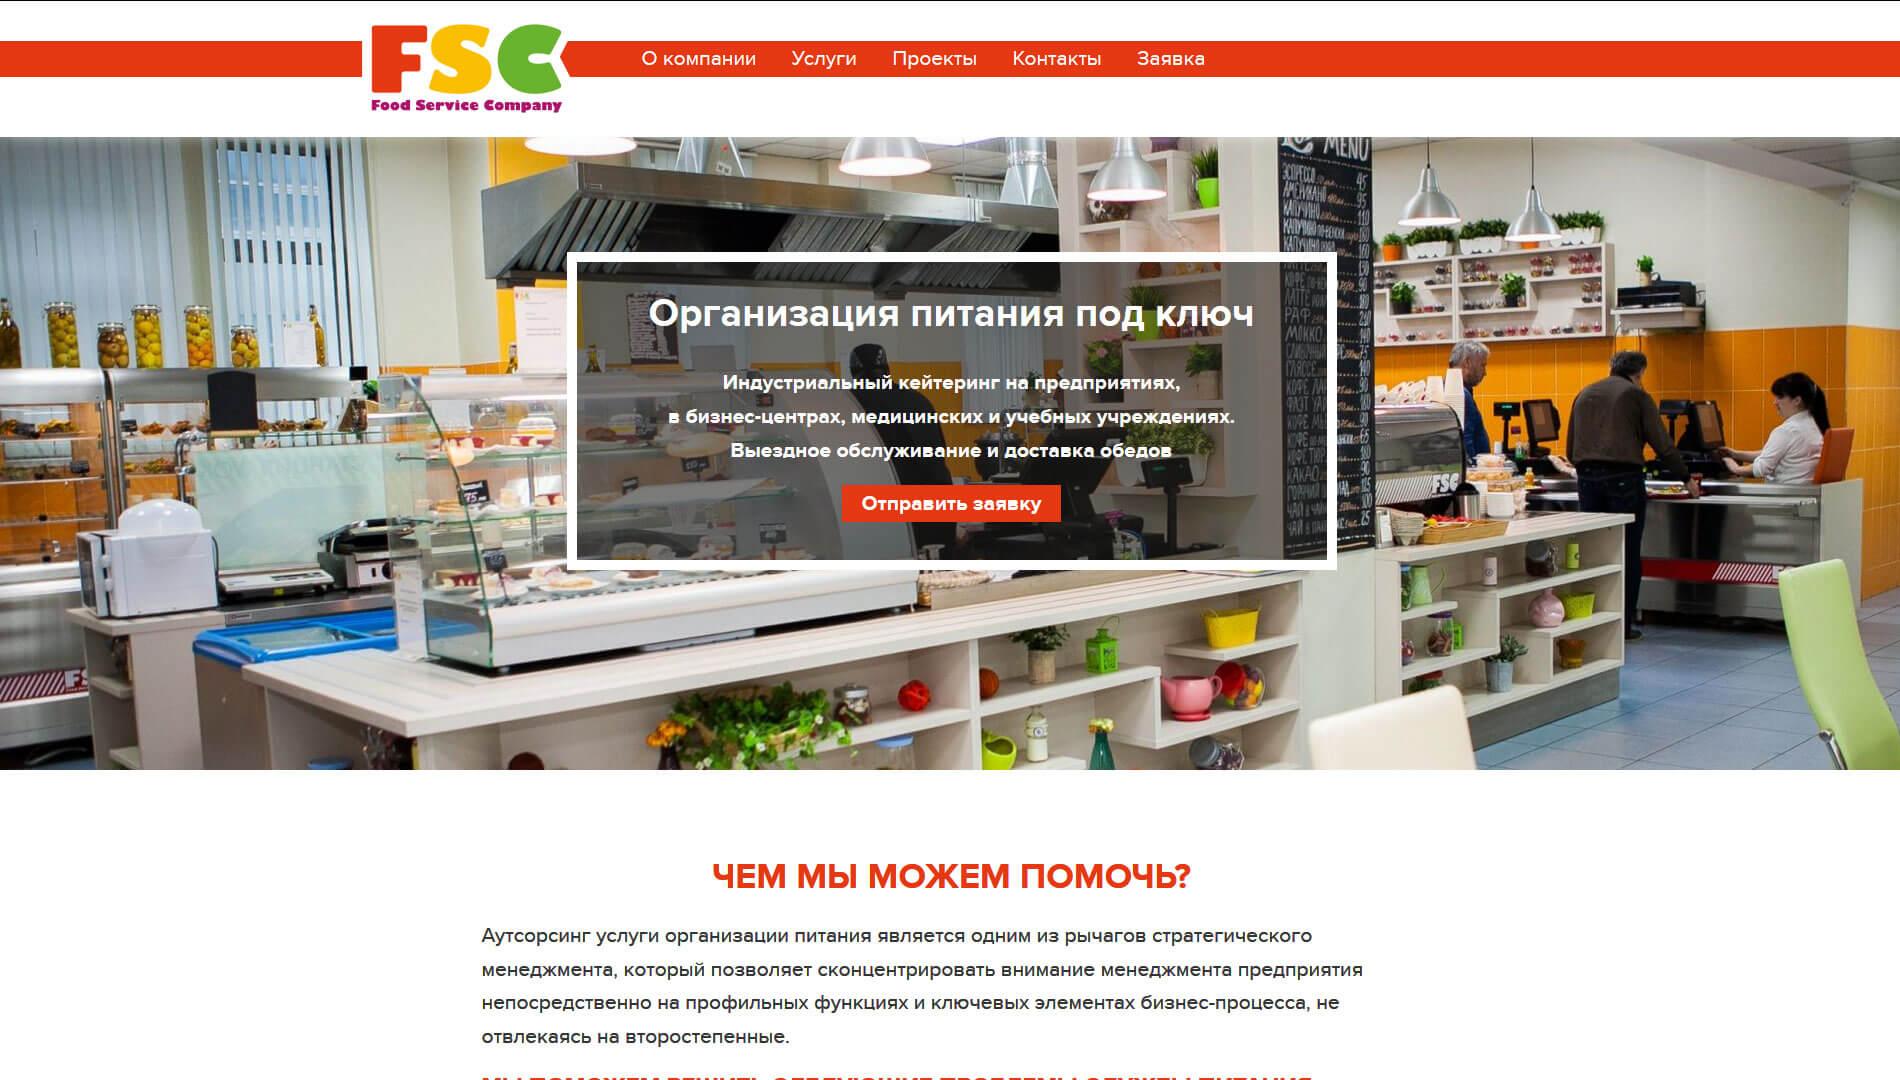 Food Service Company (Москва)